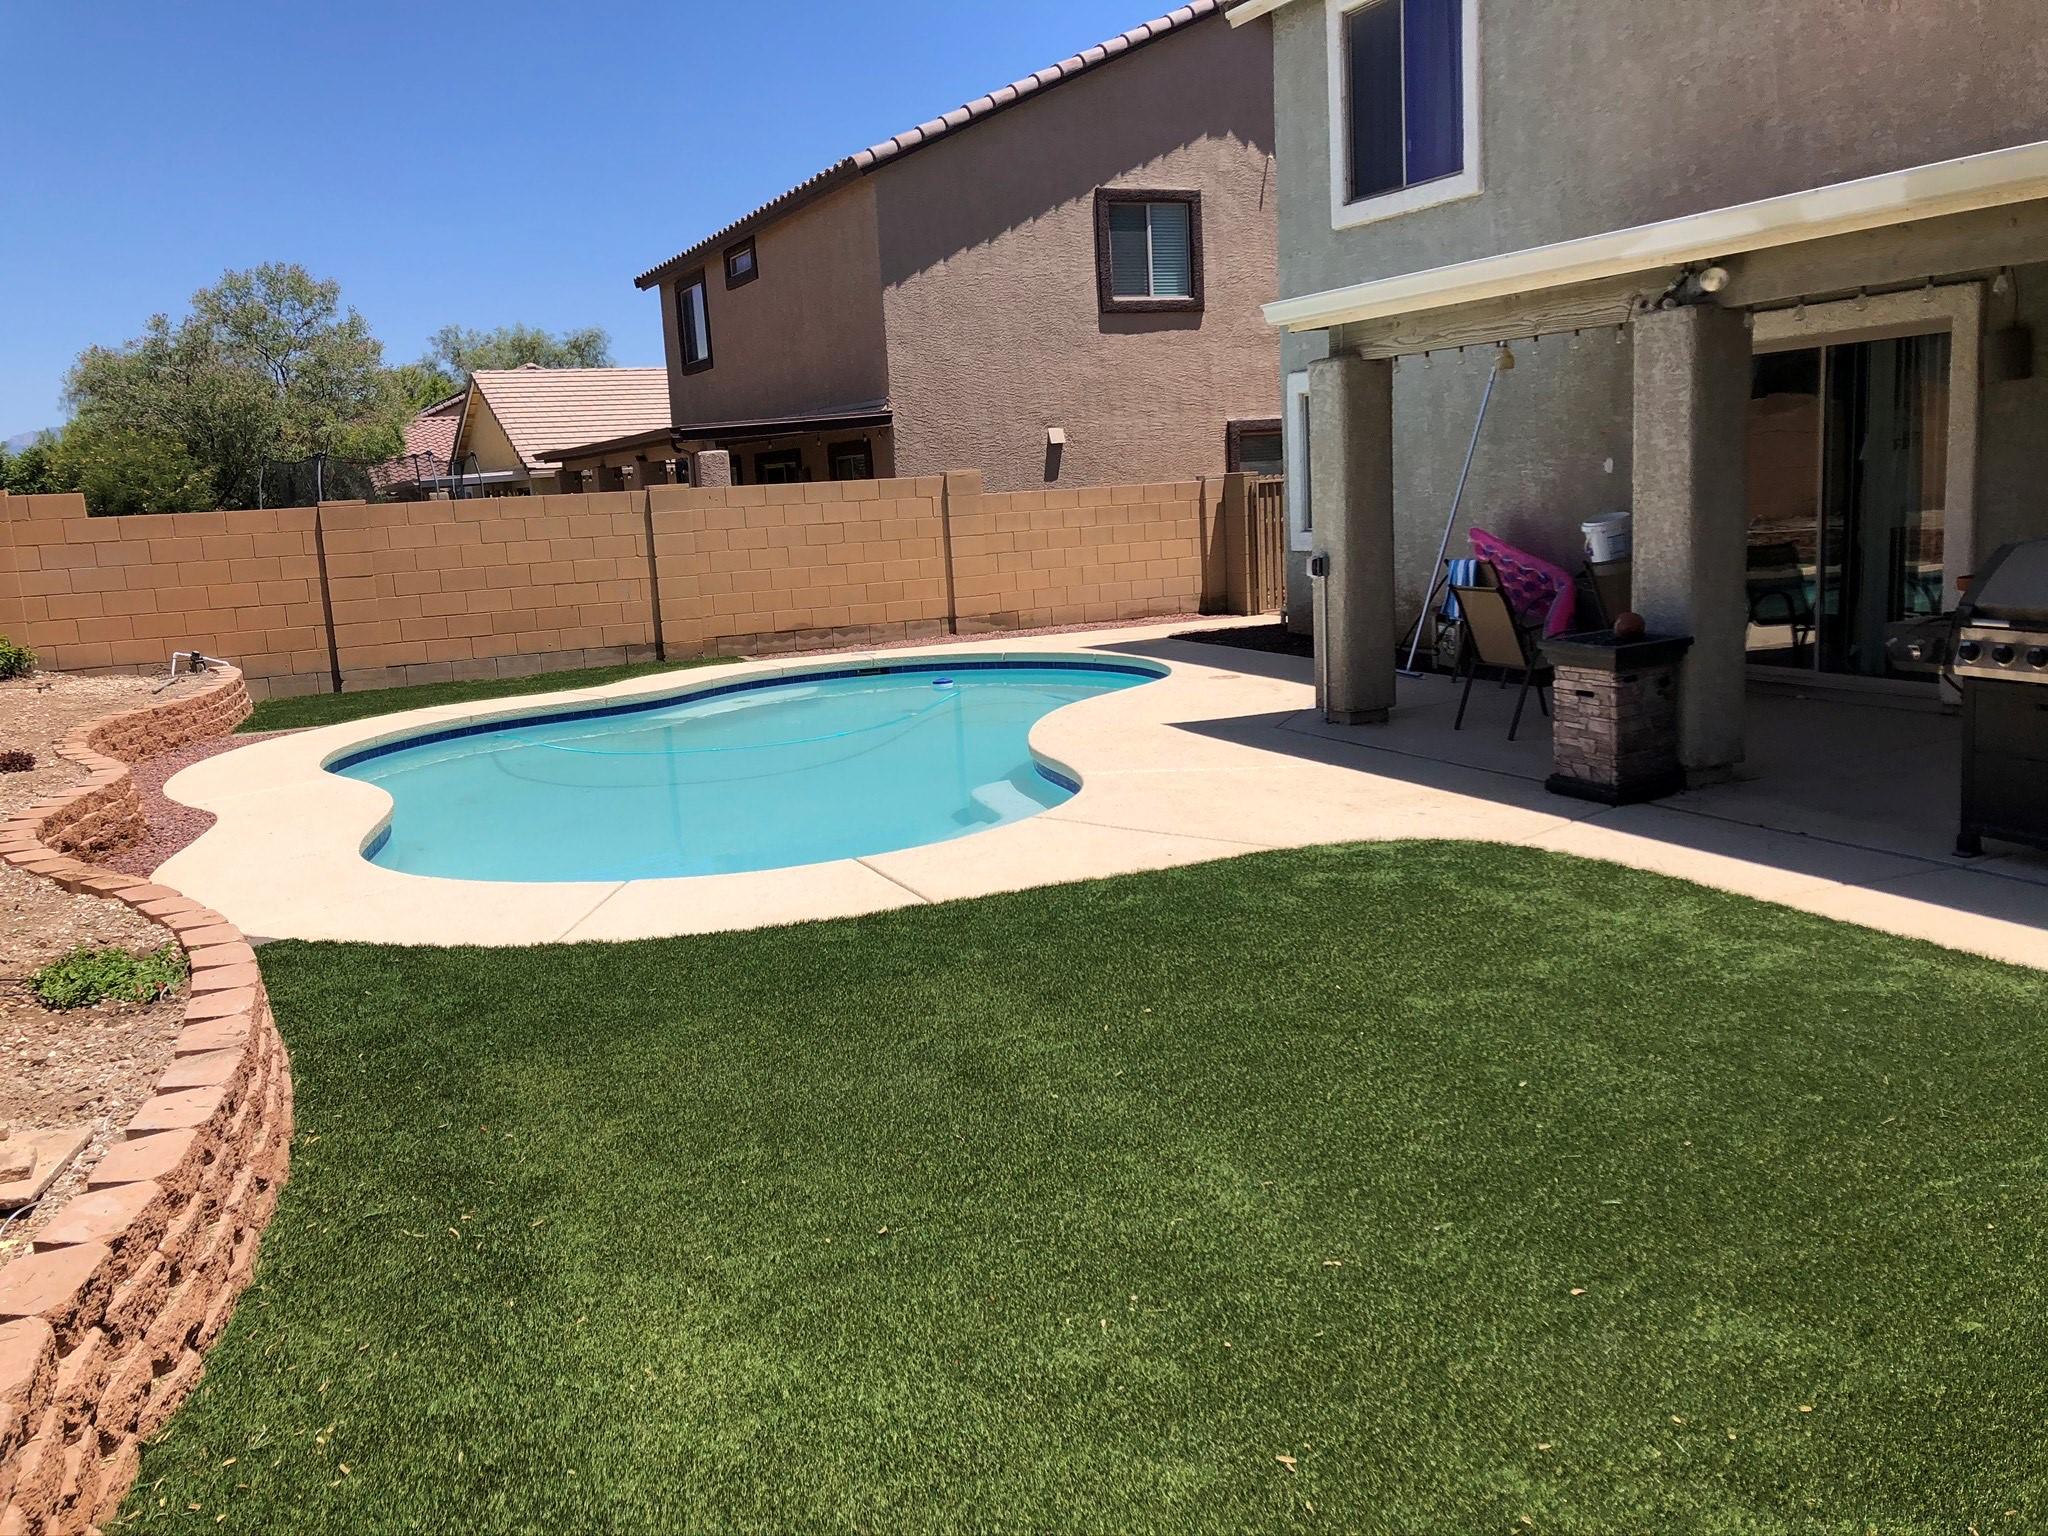 Turf and pool.jpg